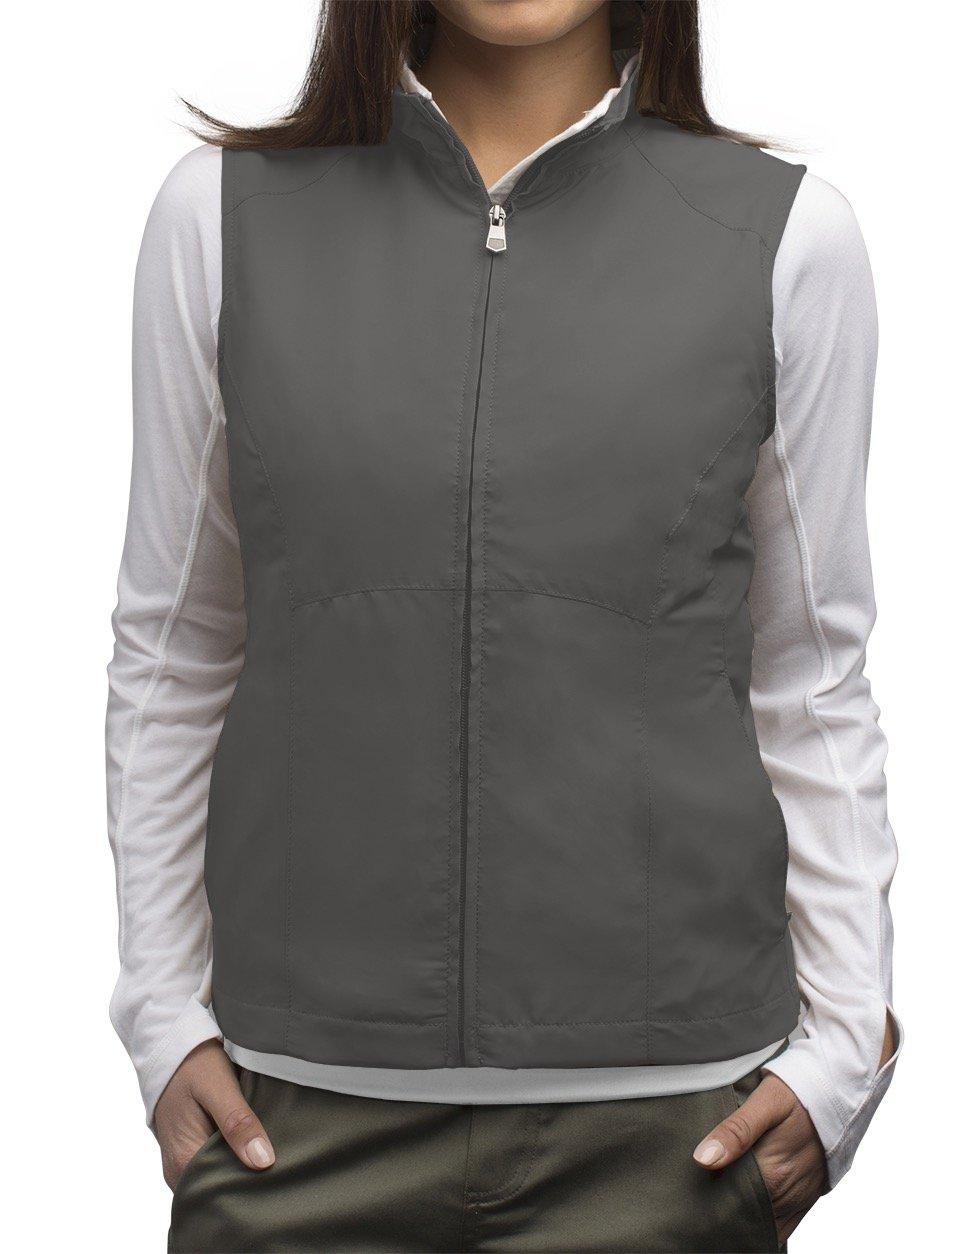 SCOTTeVEST Women's RFID Travel Vest - 18 Pockets - Travel Clothing (M1, Gray)